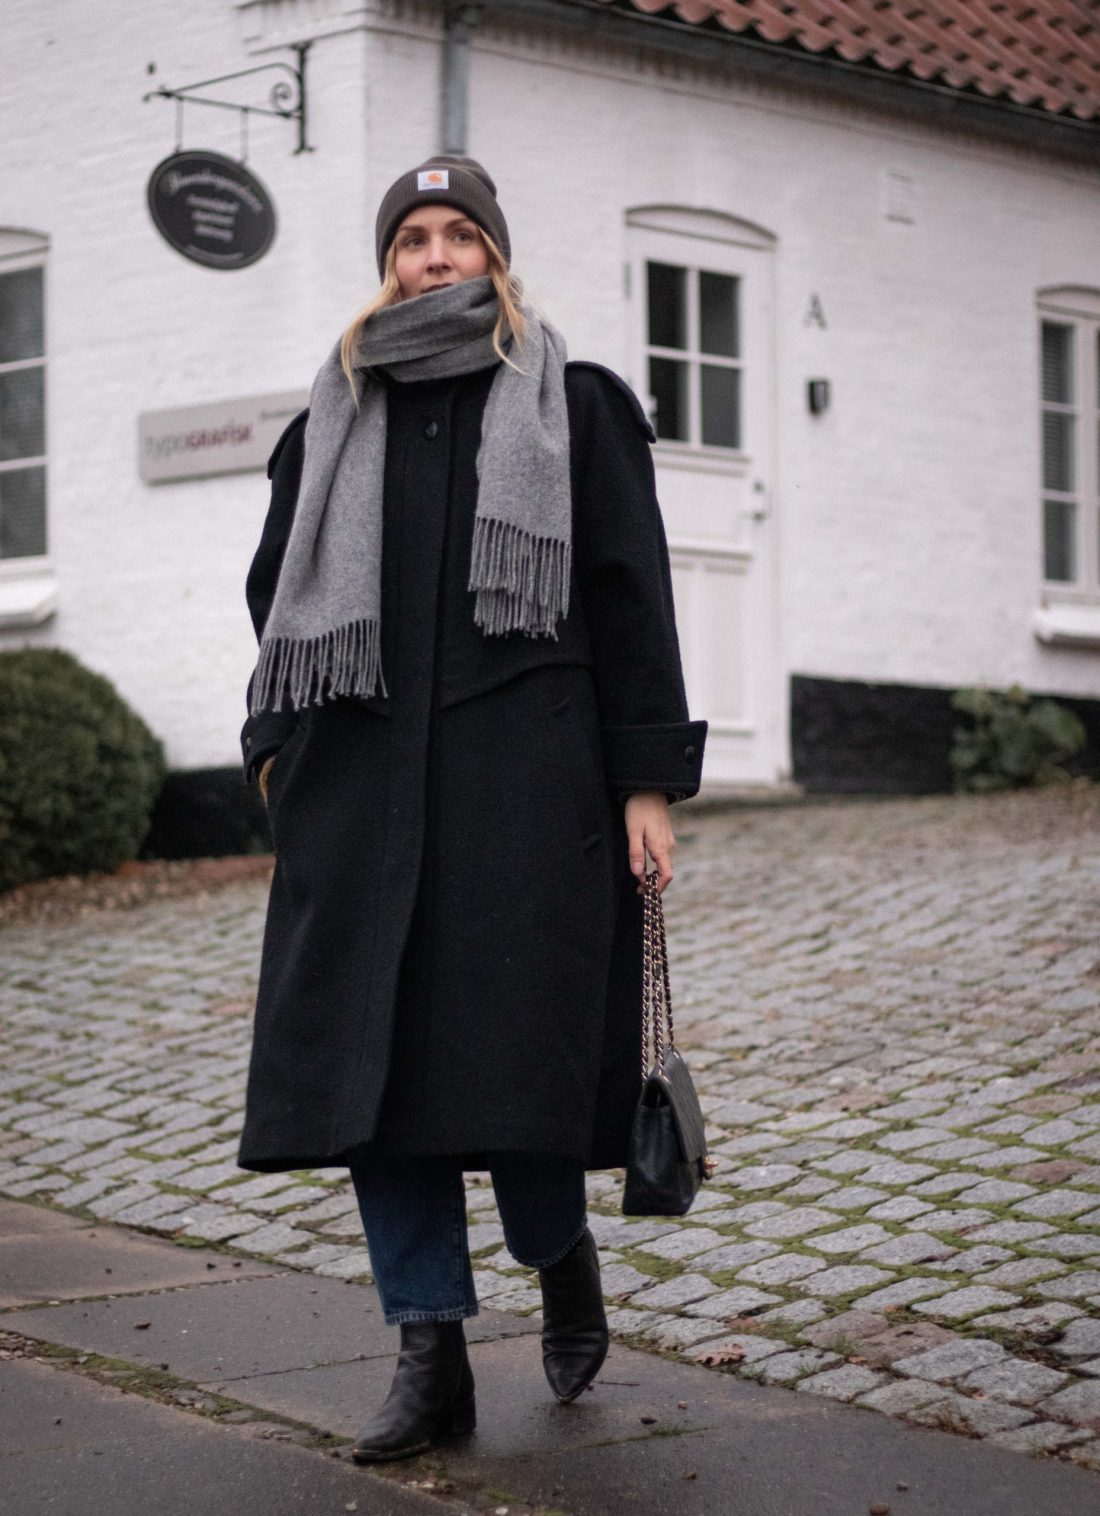 slow fashion - use less